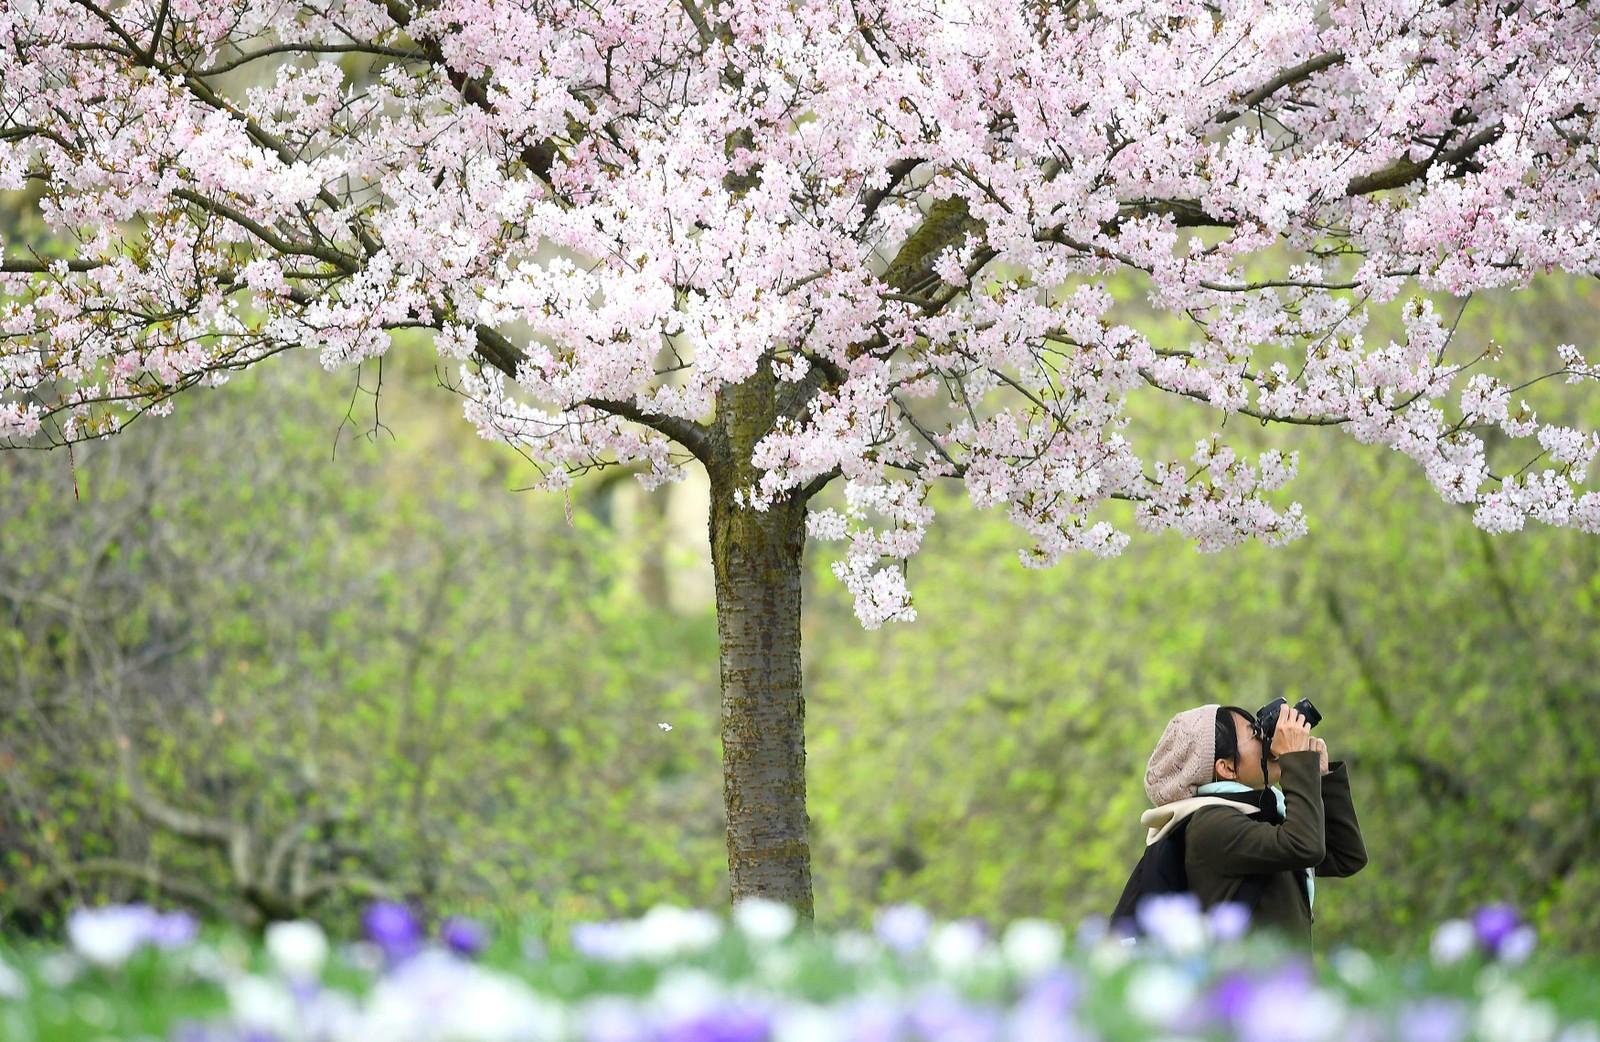 Blomstring i St. James's Park i London.